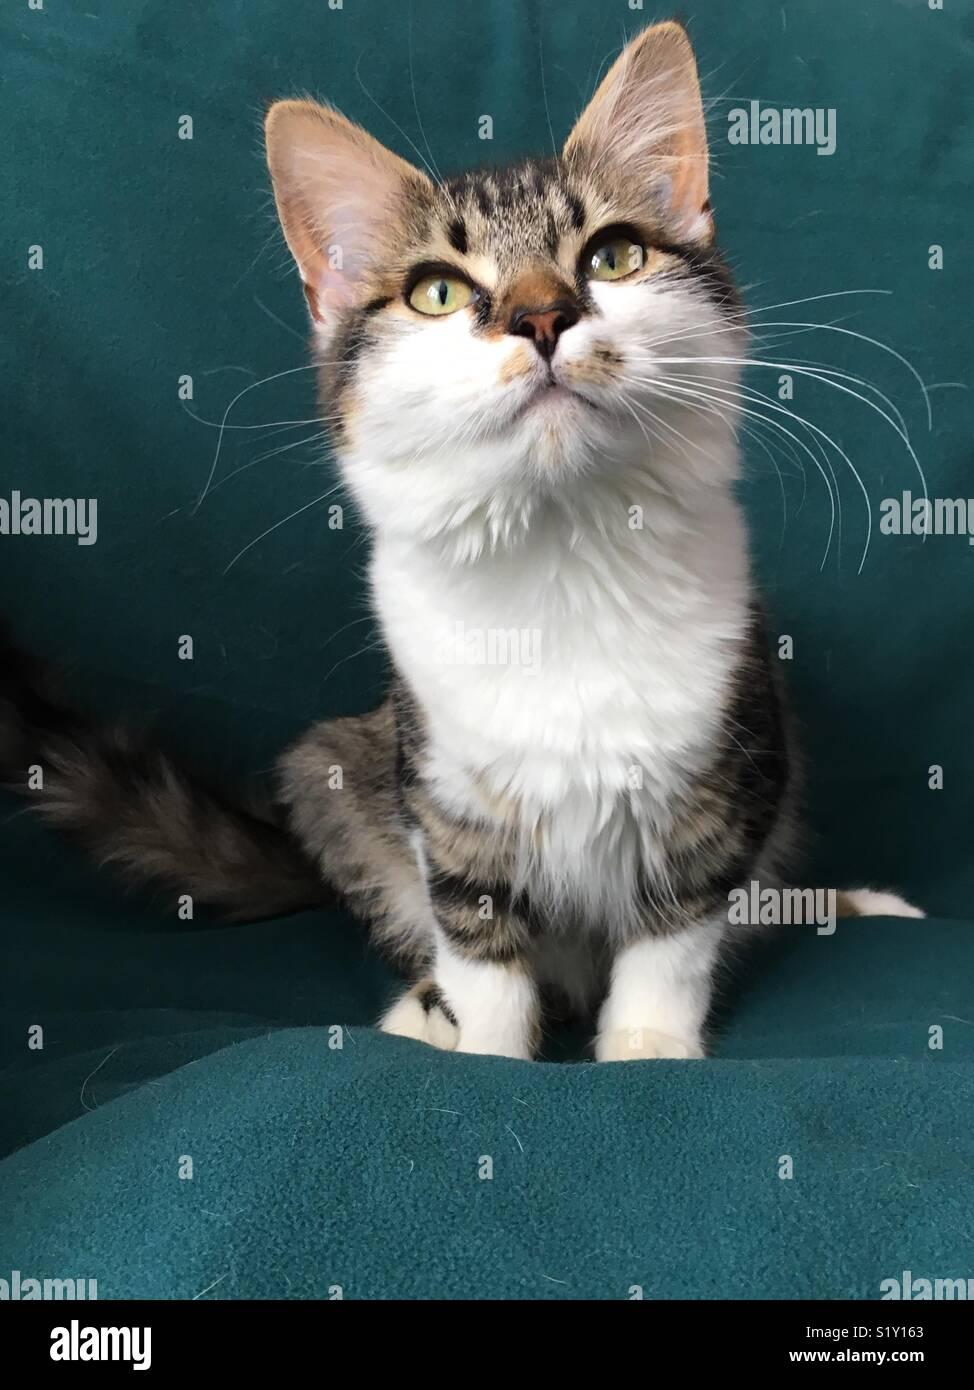 Cat sat on a green blanket looking upward - Stock Image